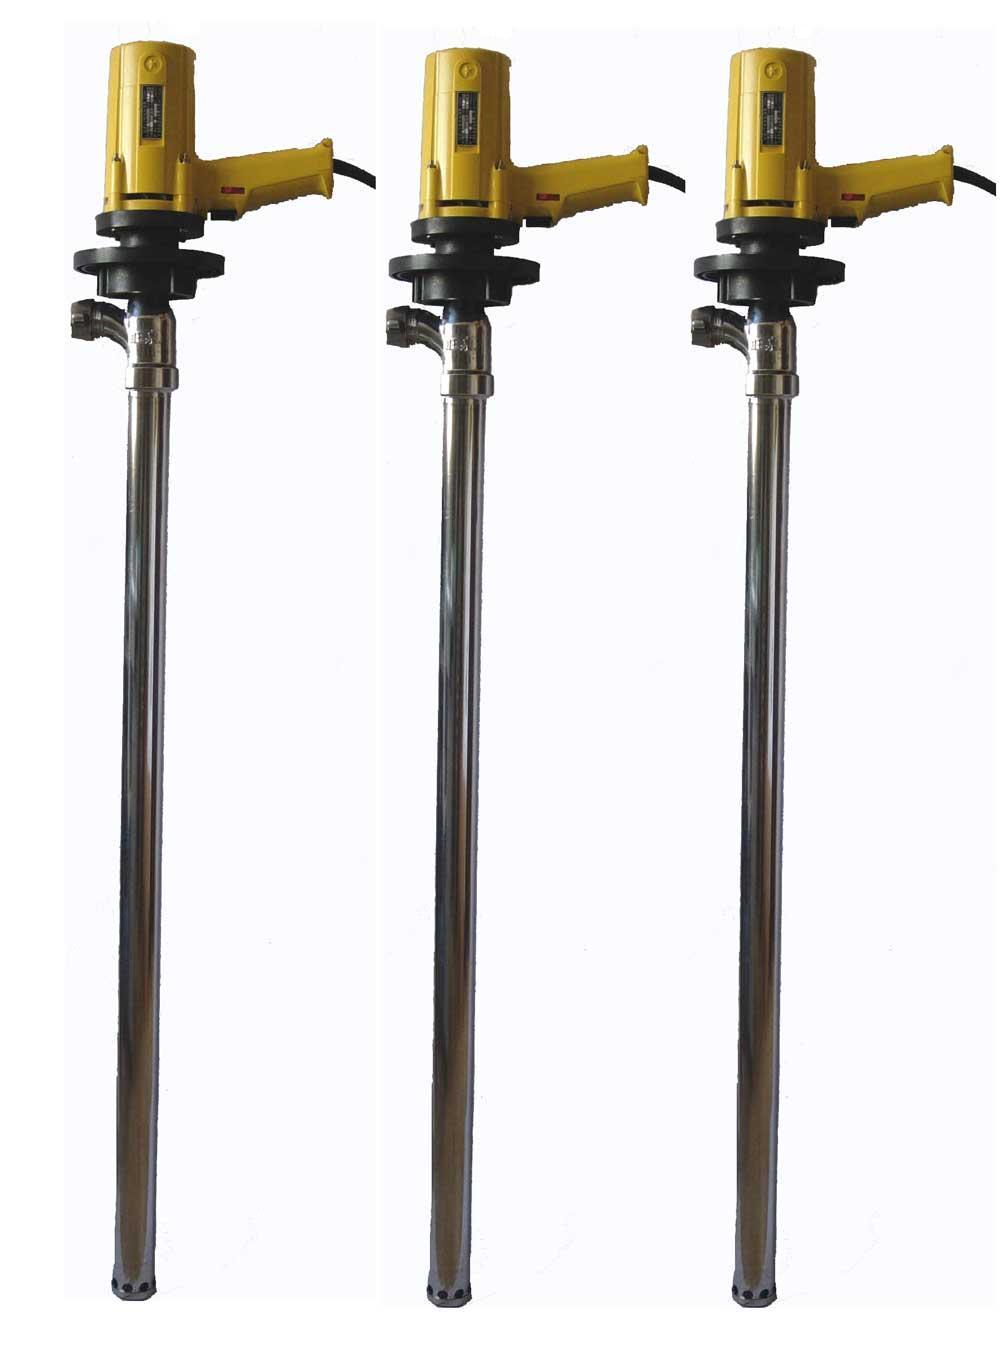 Sb drum oil pump buy hand pump drum pump oil pump for Motor oil by the barrel